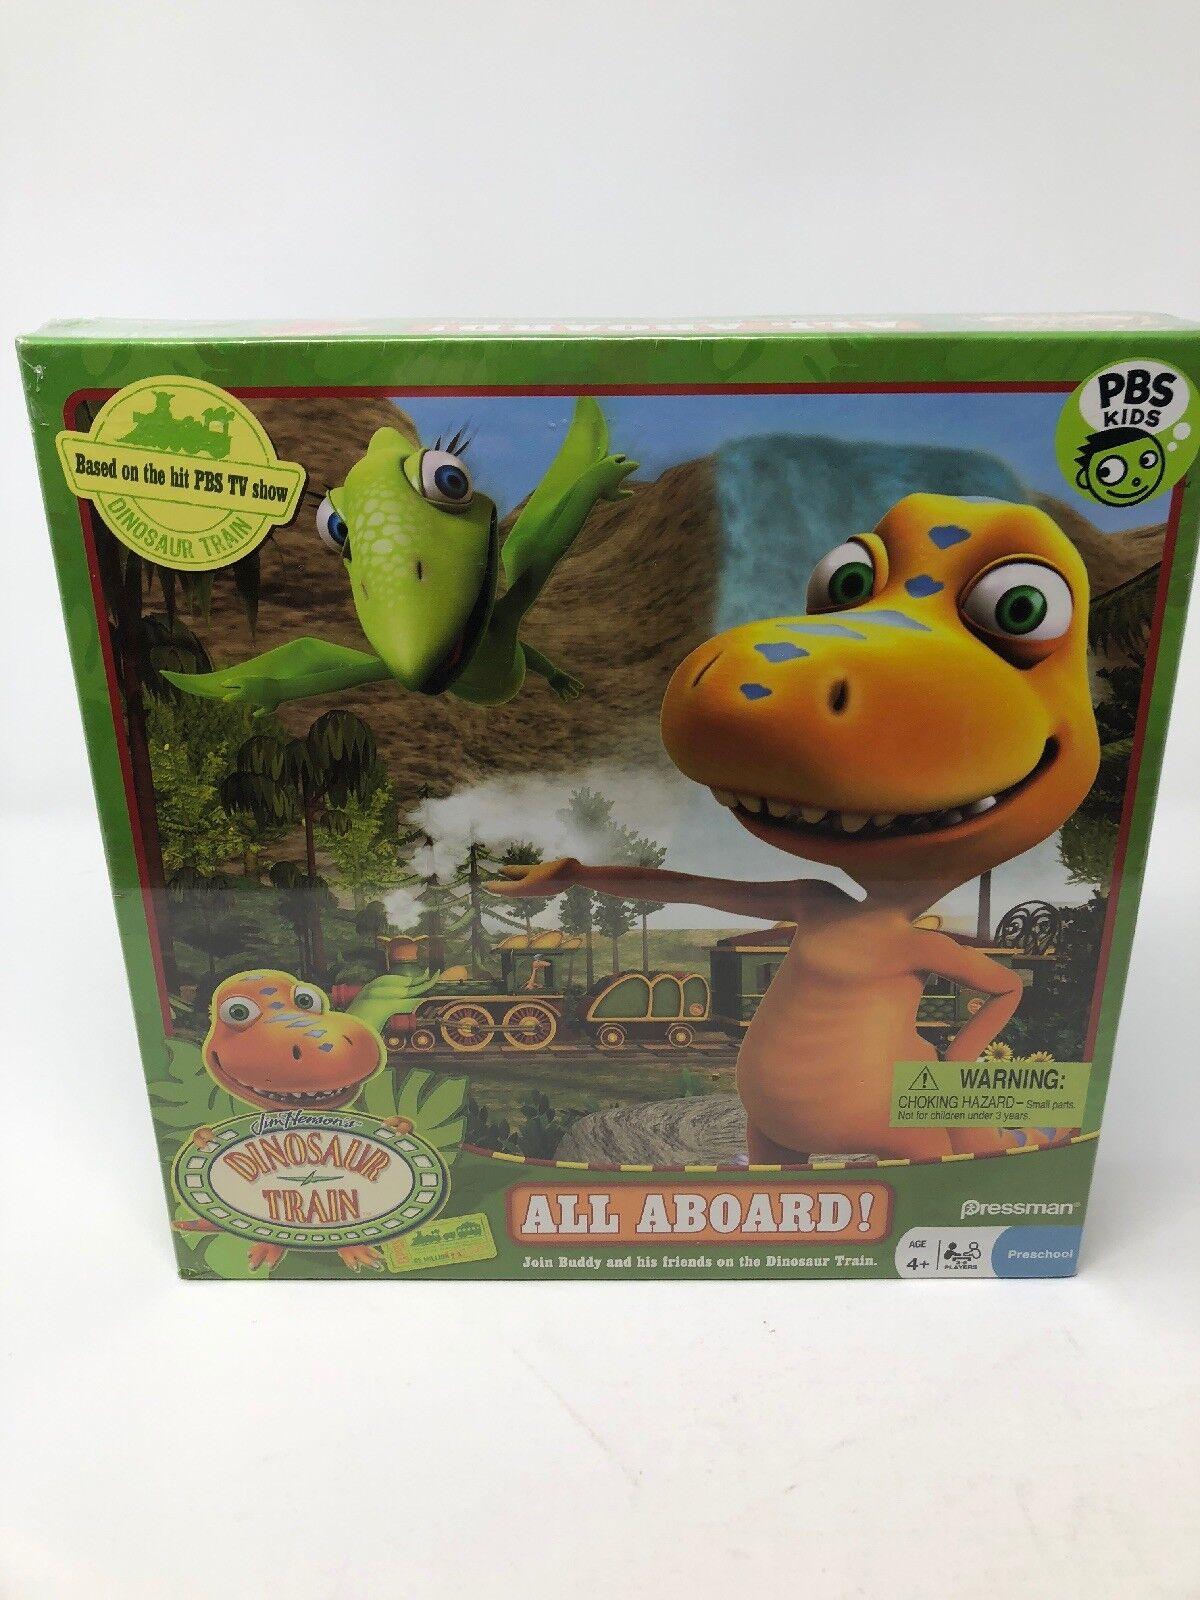 Dinosaur Train todos a bordo juego PBS Kids 2010 Pressman